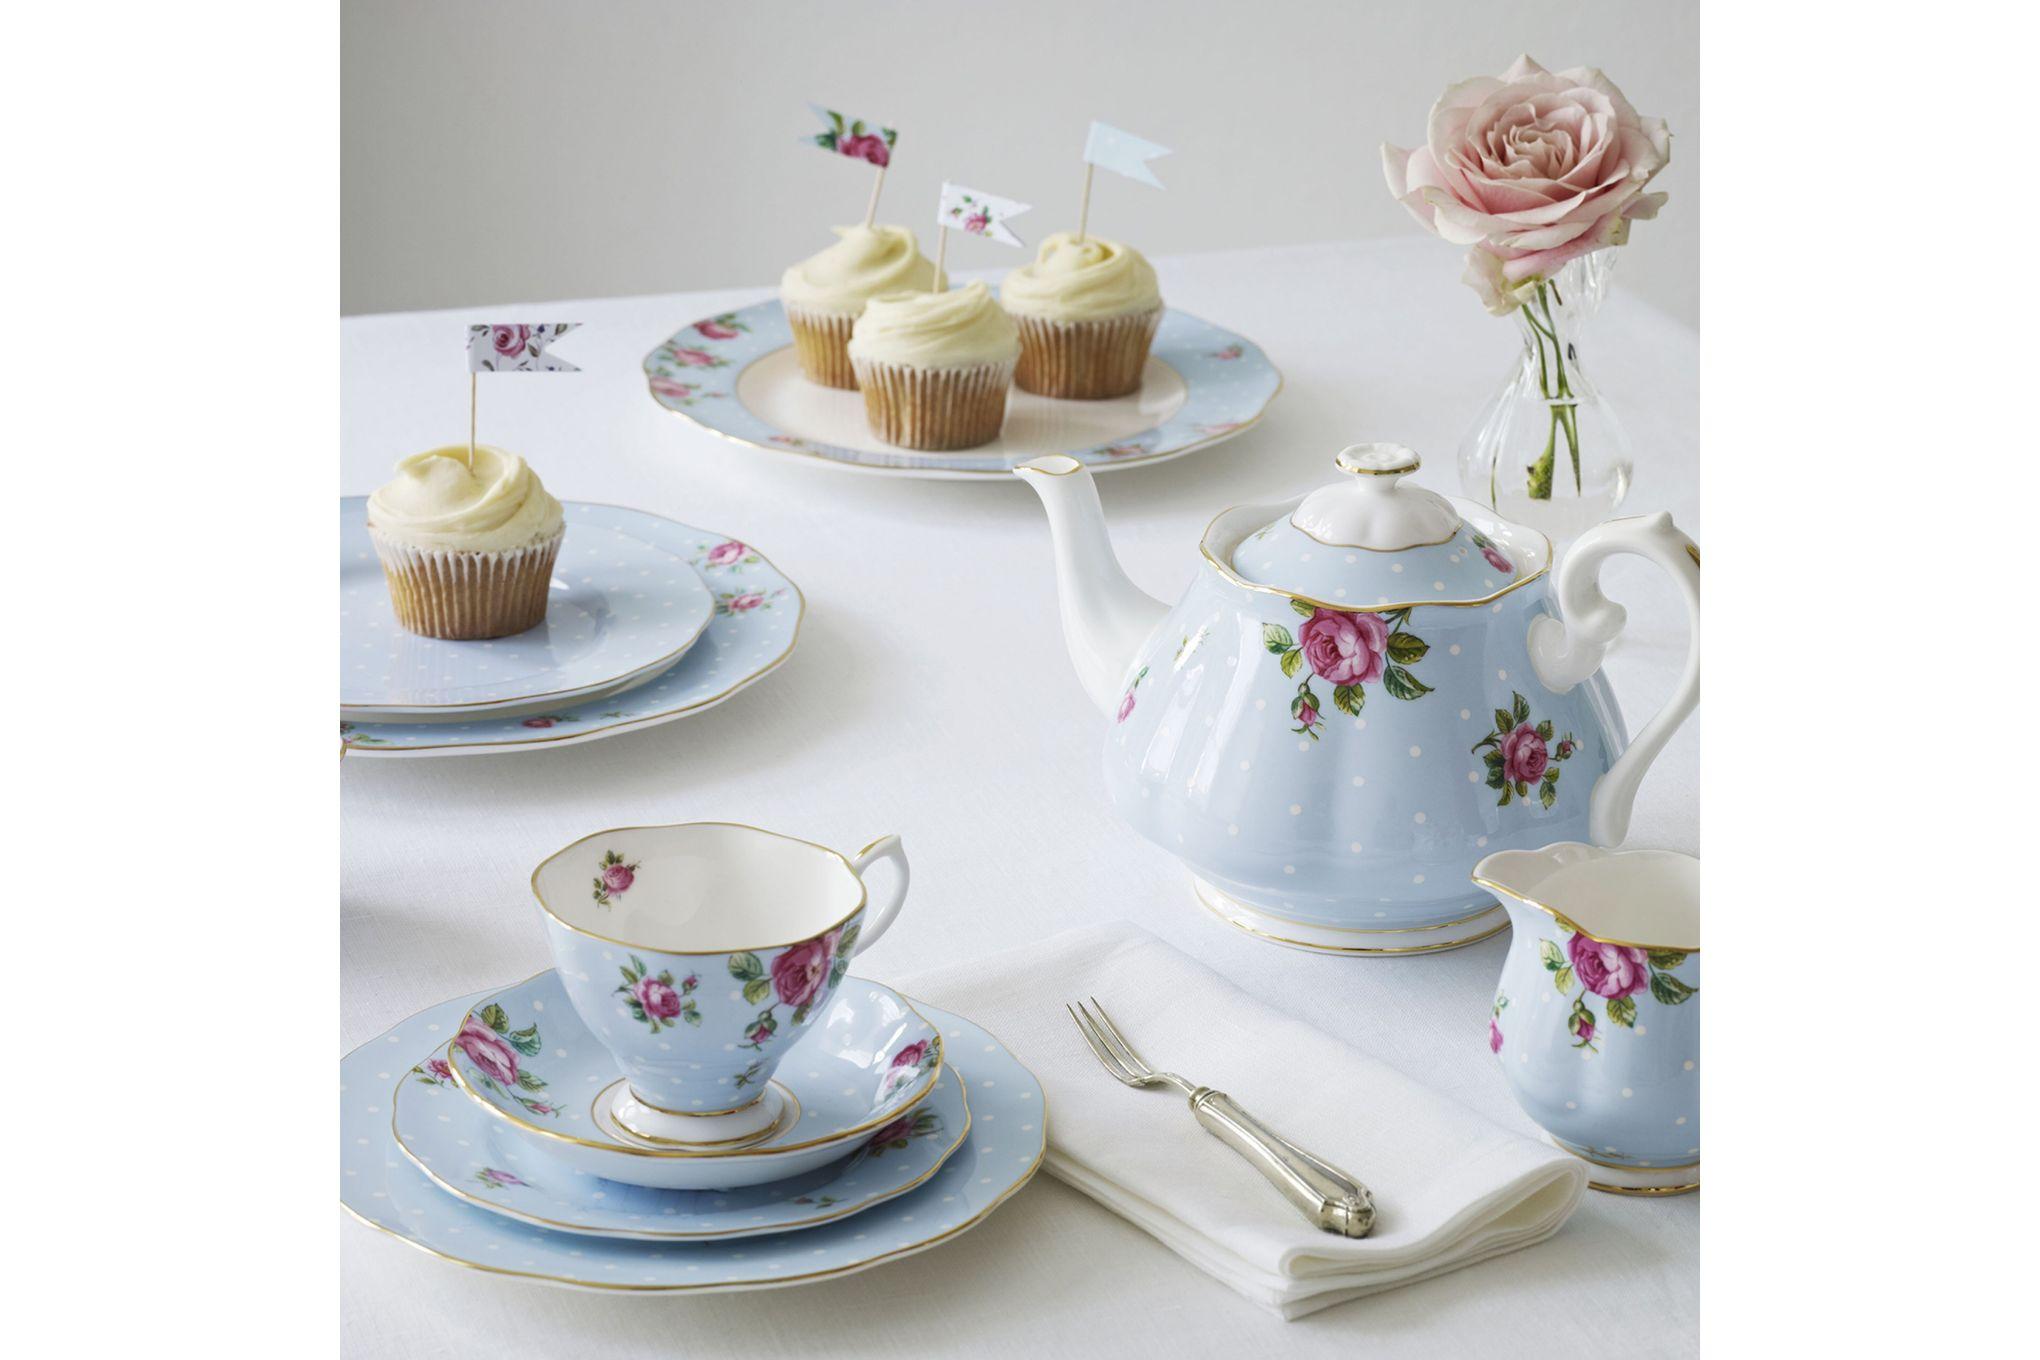 Royal Albert Polka Blue Teacup & Saucer Boxed thumb 4